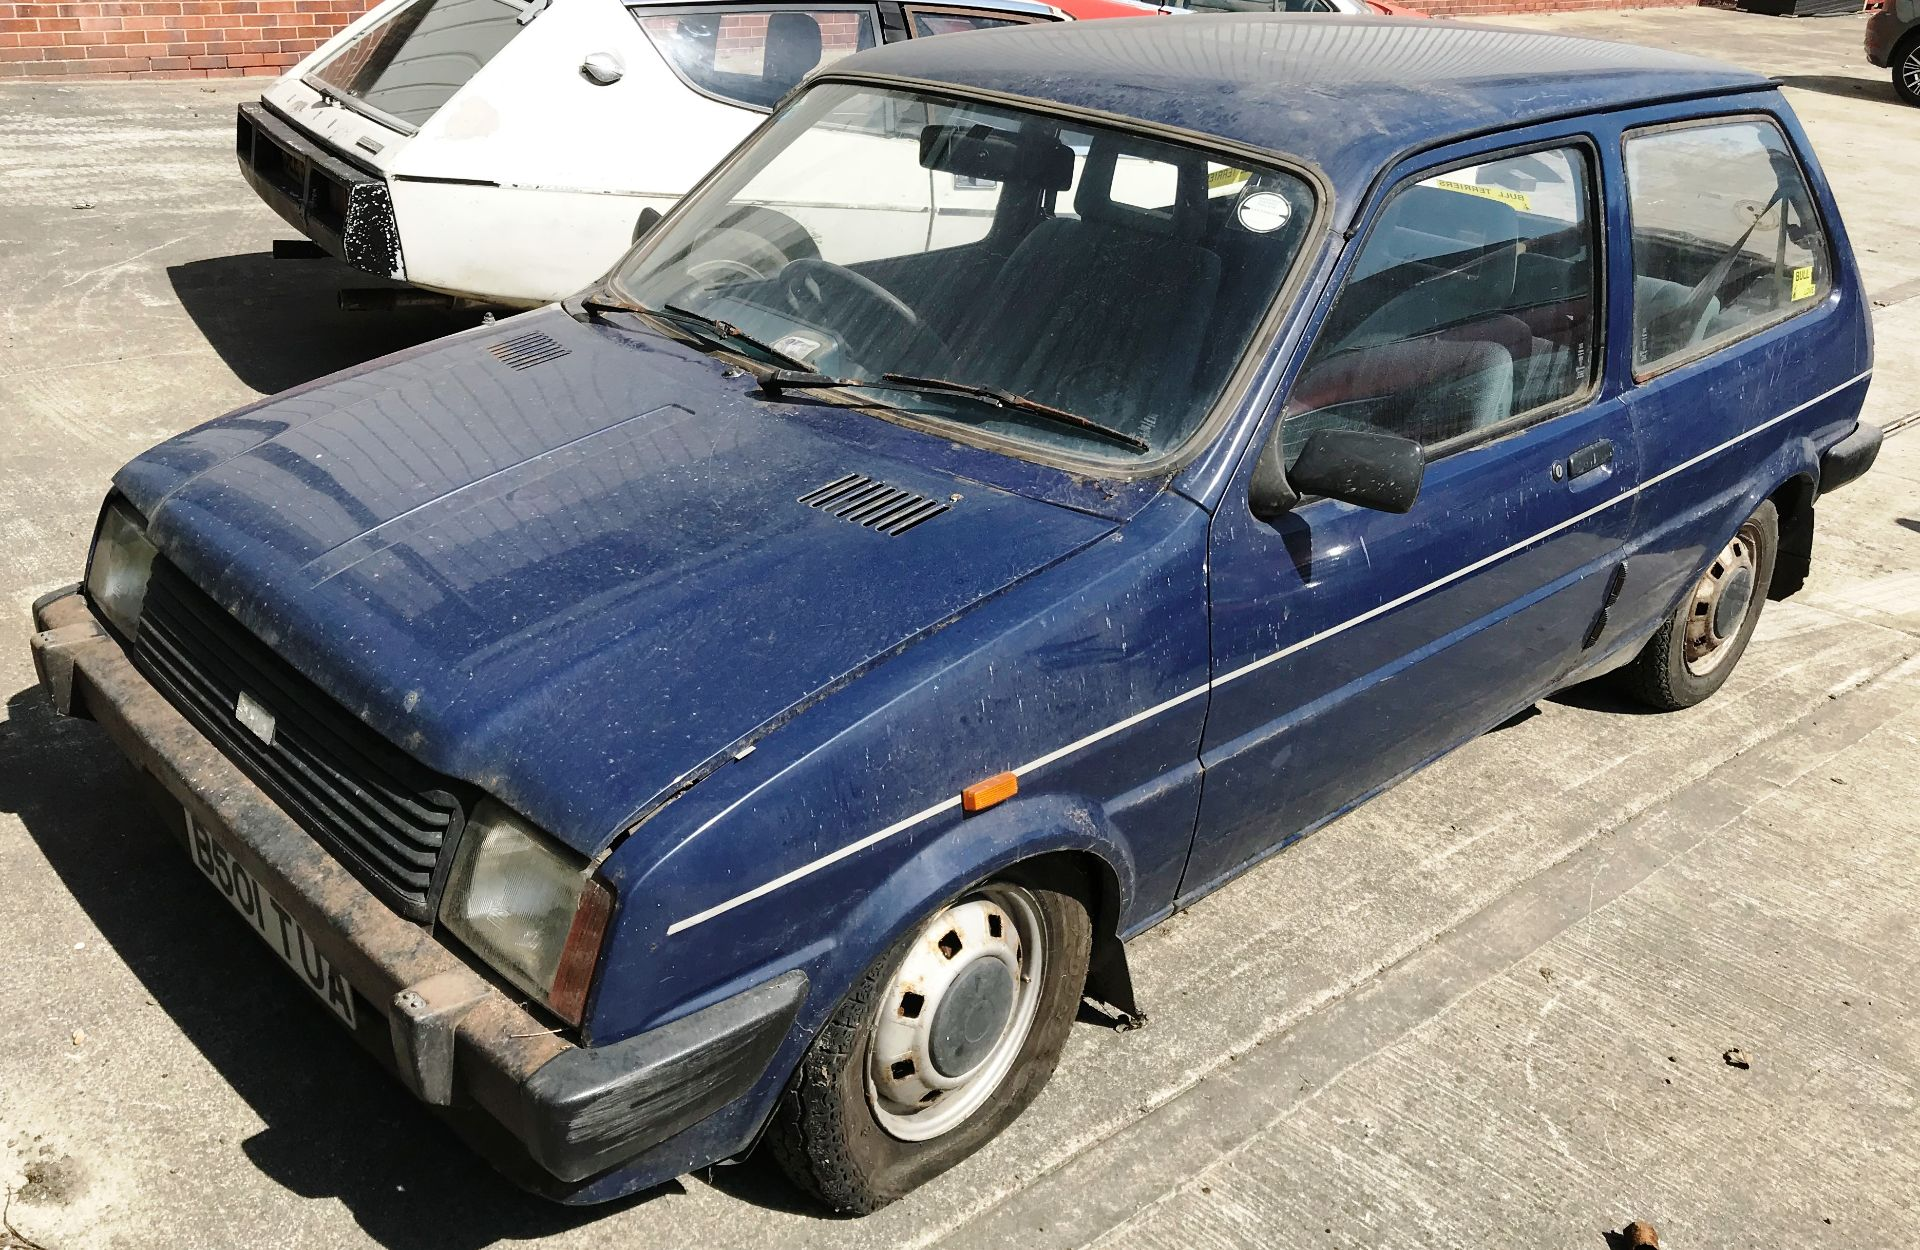 GARAGE FIND - IN NEED OF FULL RESTORATION AUSTIN METRO 1300L 3 DOOR HATCHBACK - petrol - blue